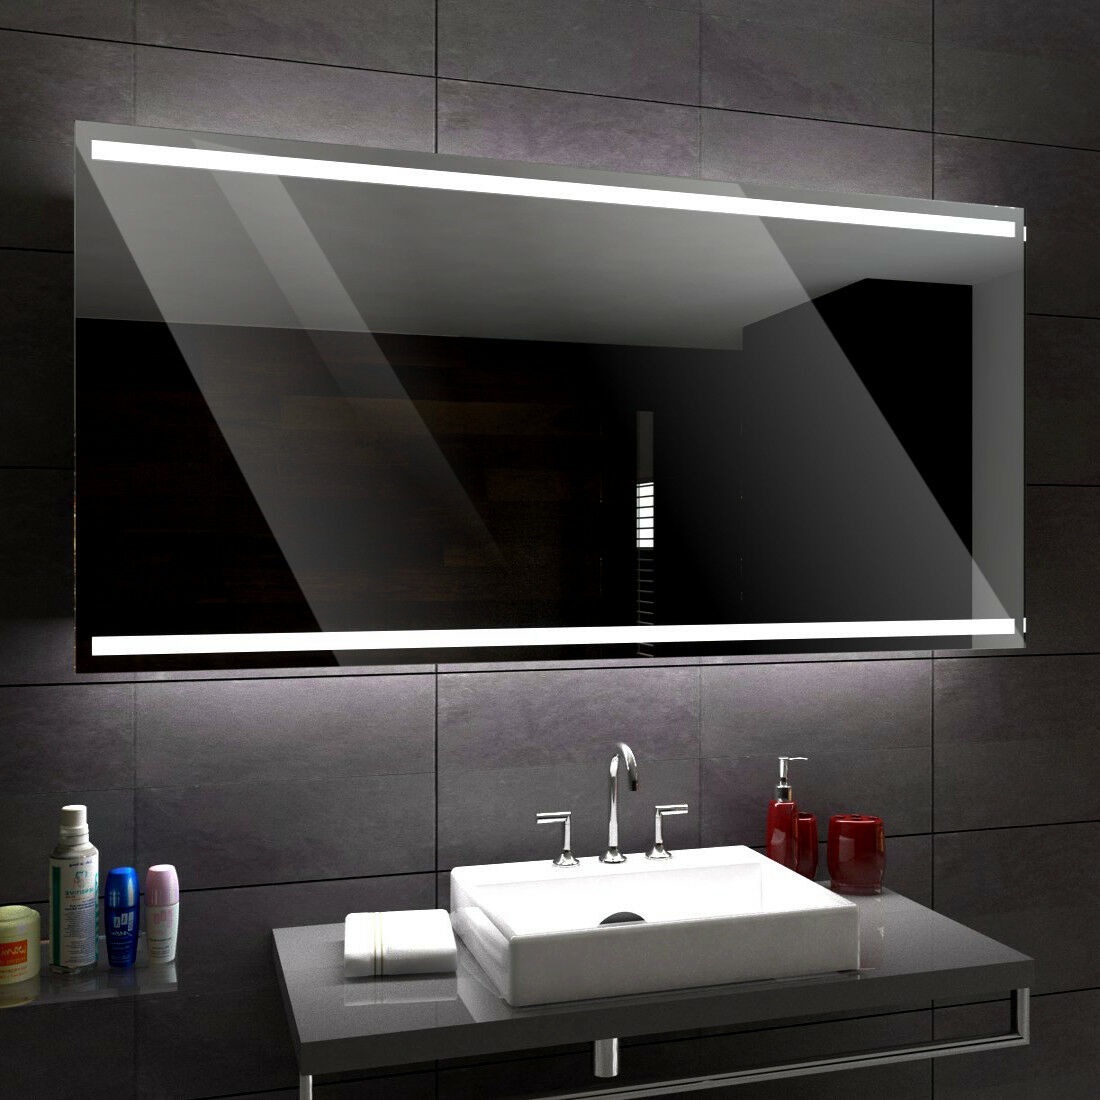 s l1600 - Denver ILUMINADO LED Espejo Del Baño a medida tamaño variantes - a medida